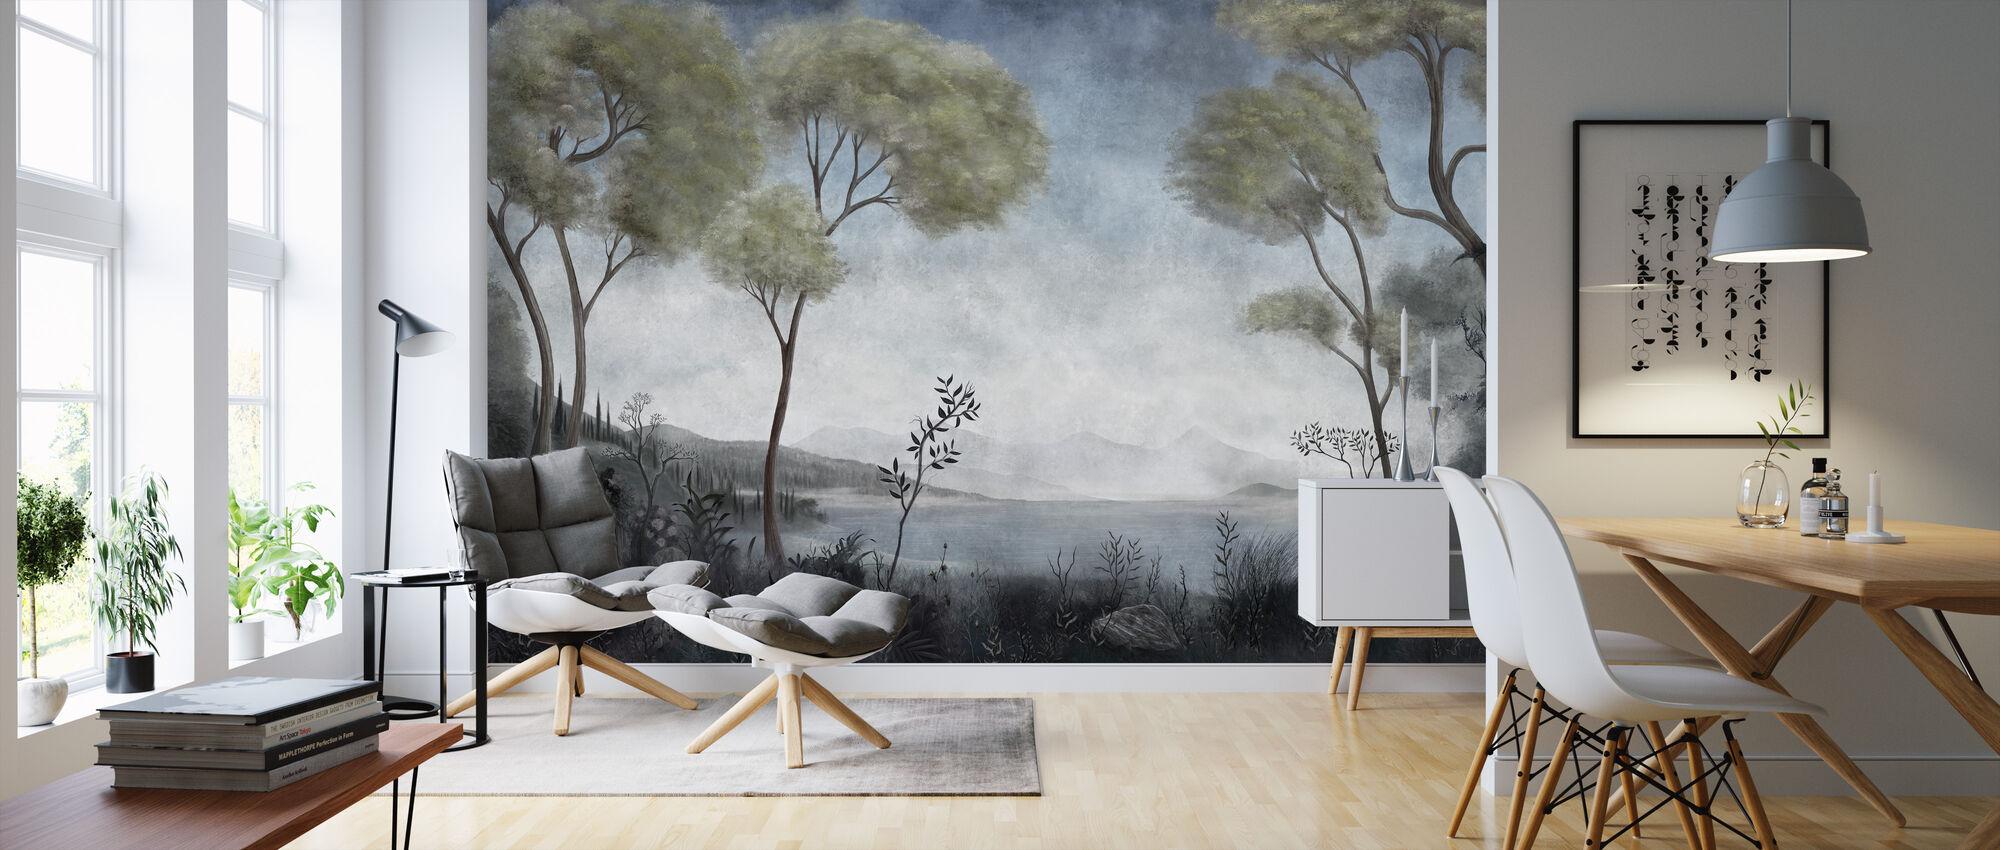 Lake Como - Wallpaper - Living Room